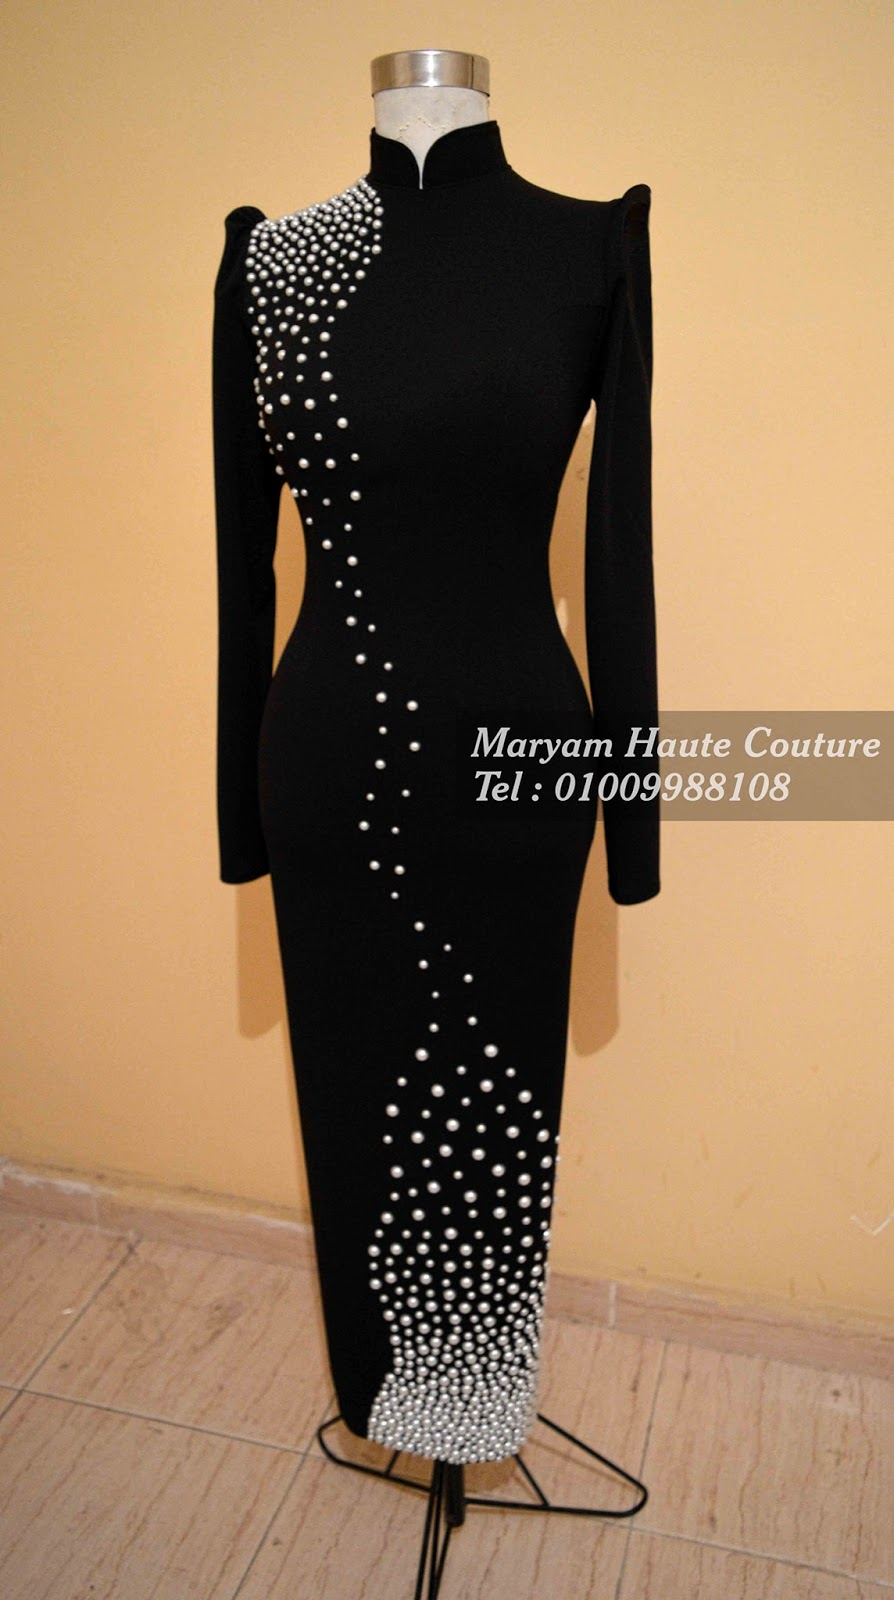 Black evening dress with long sleeves - فستان سواريه شيك باللون الاسود